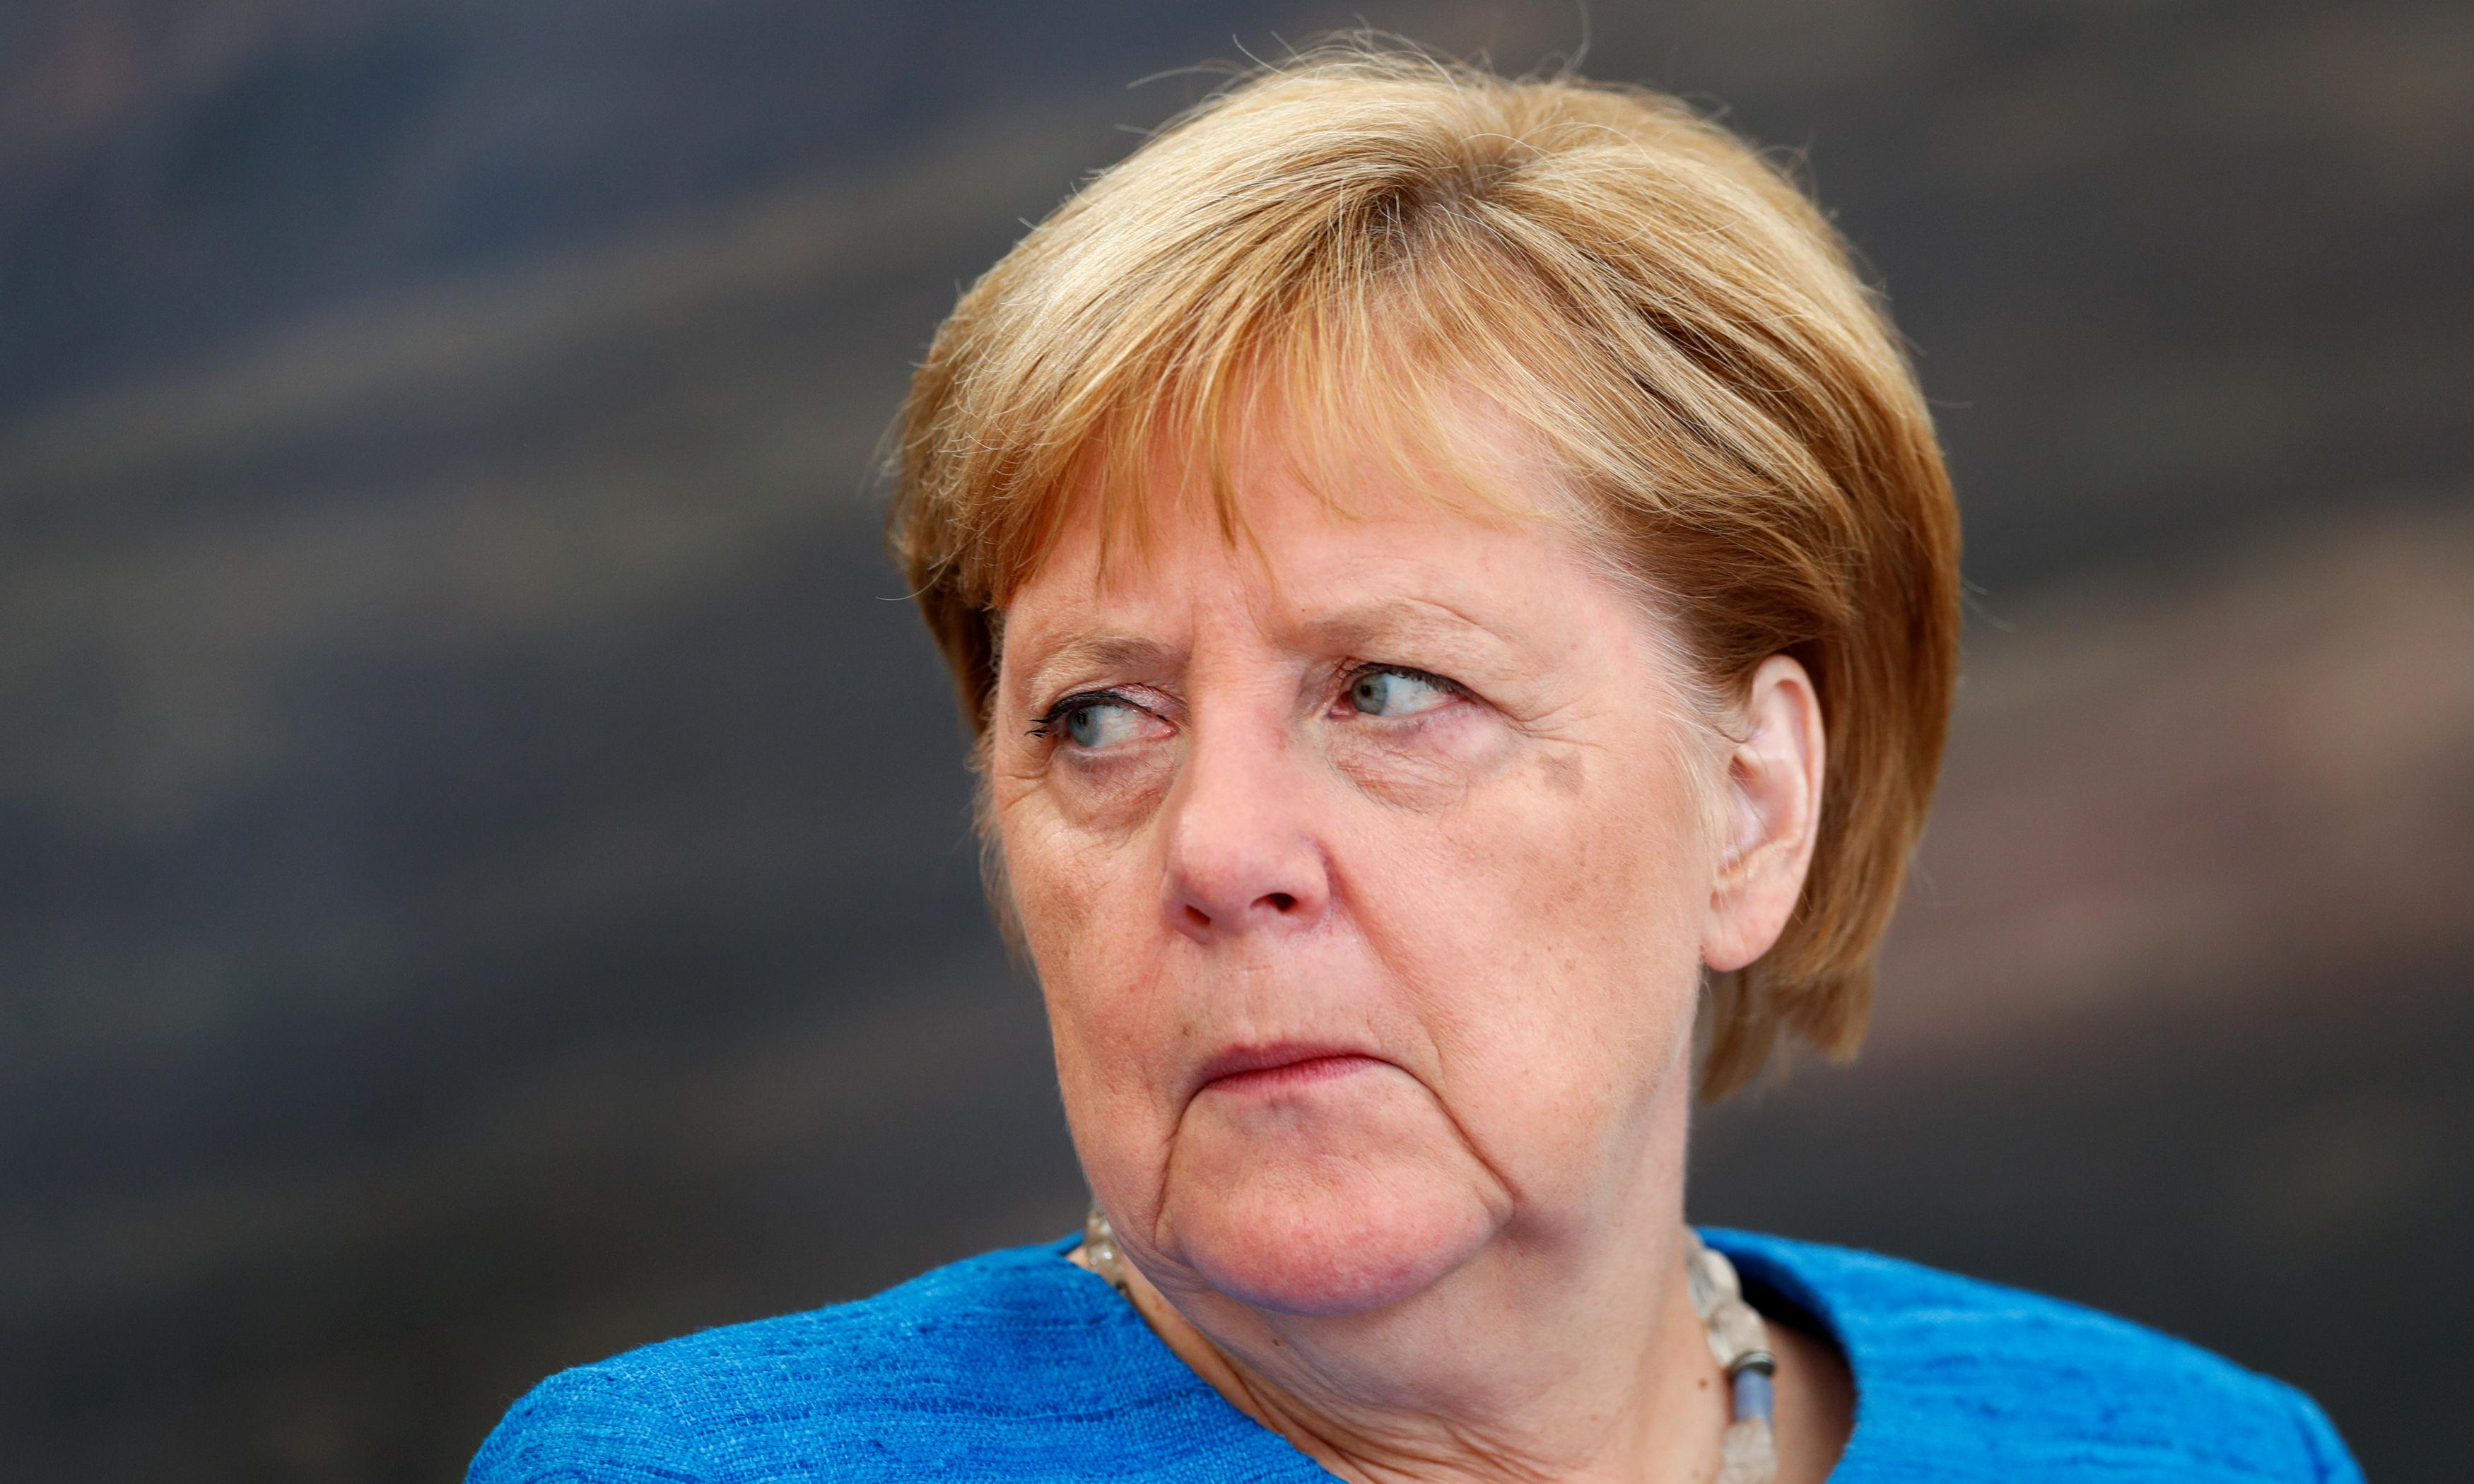 Boris Johnson visit will not change German stance, says Merkel ally